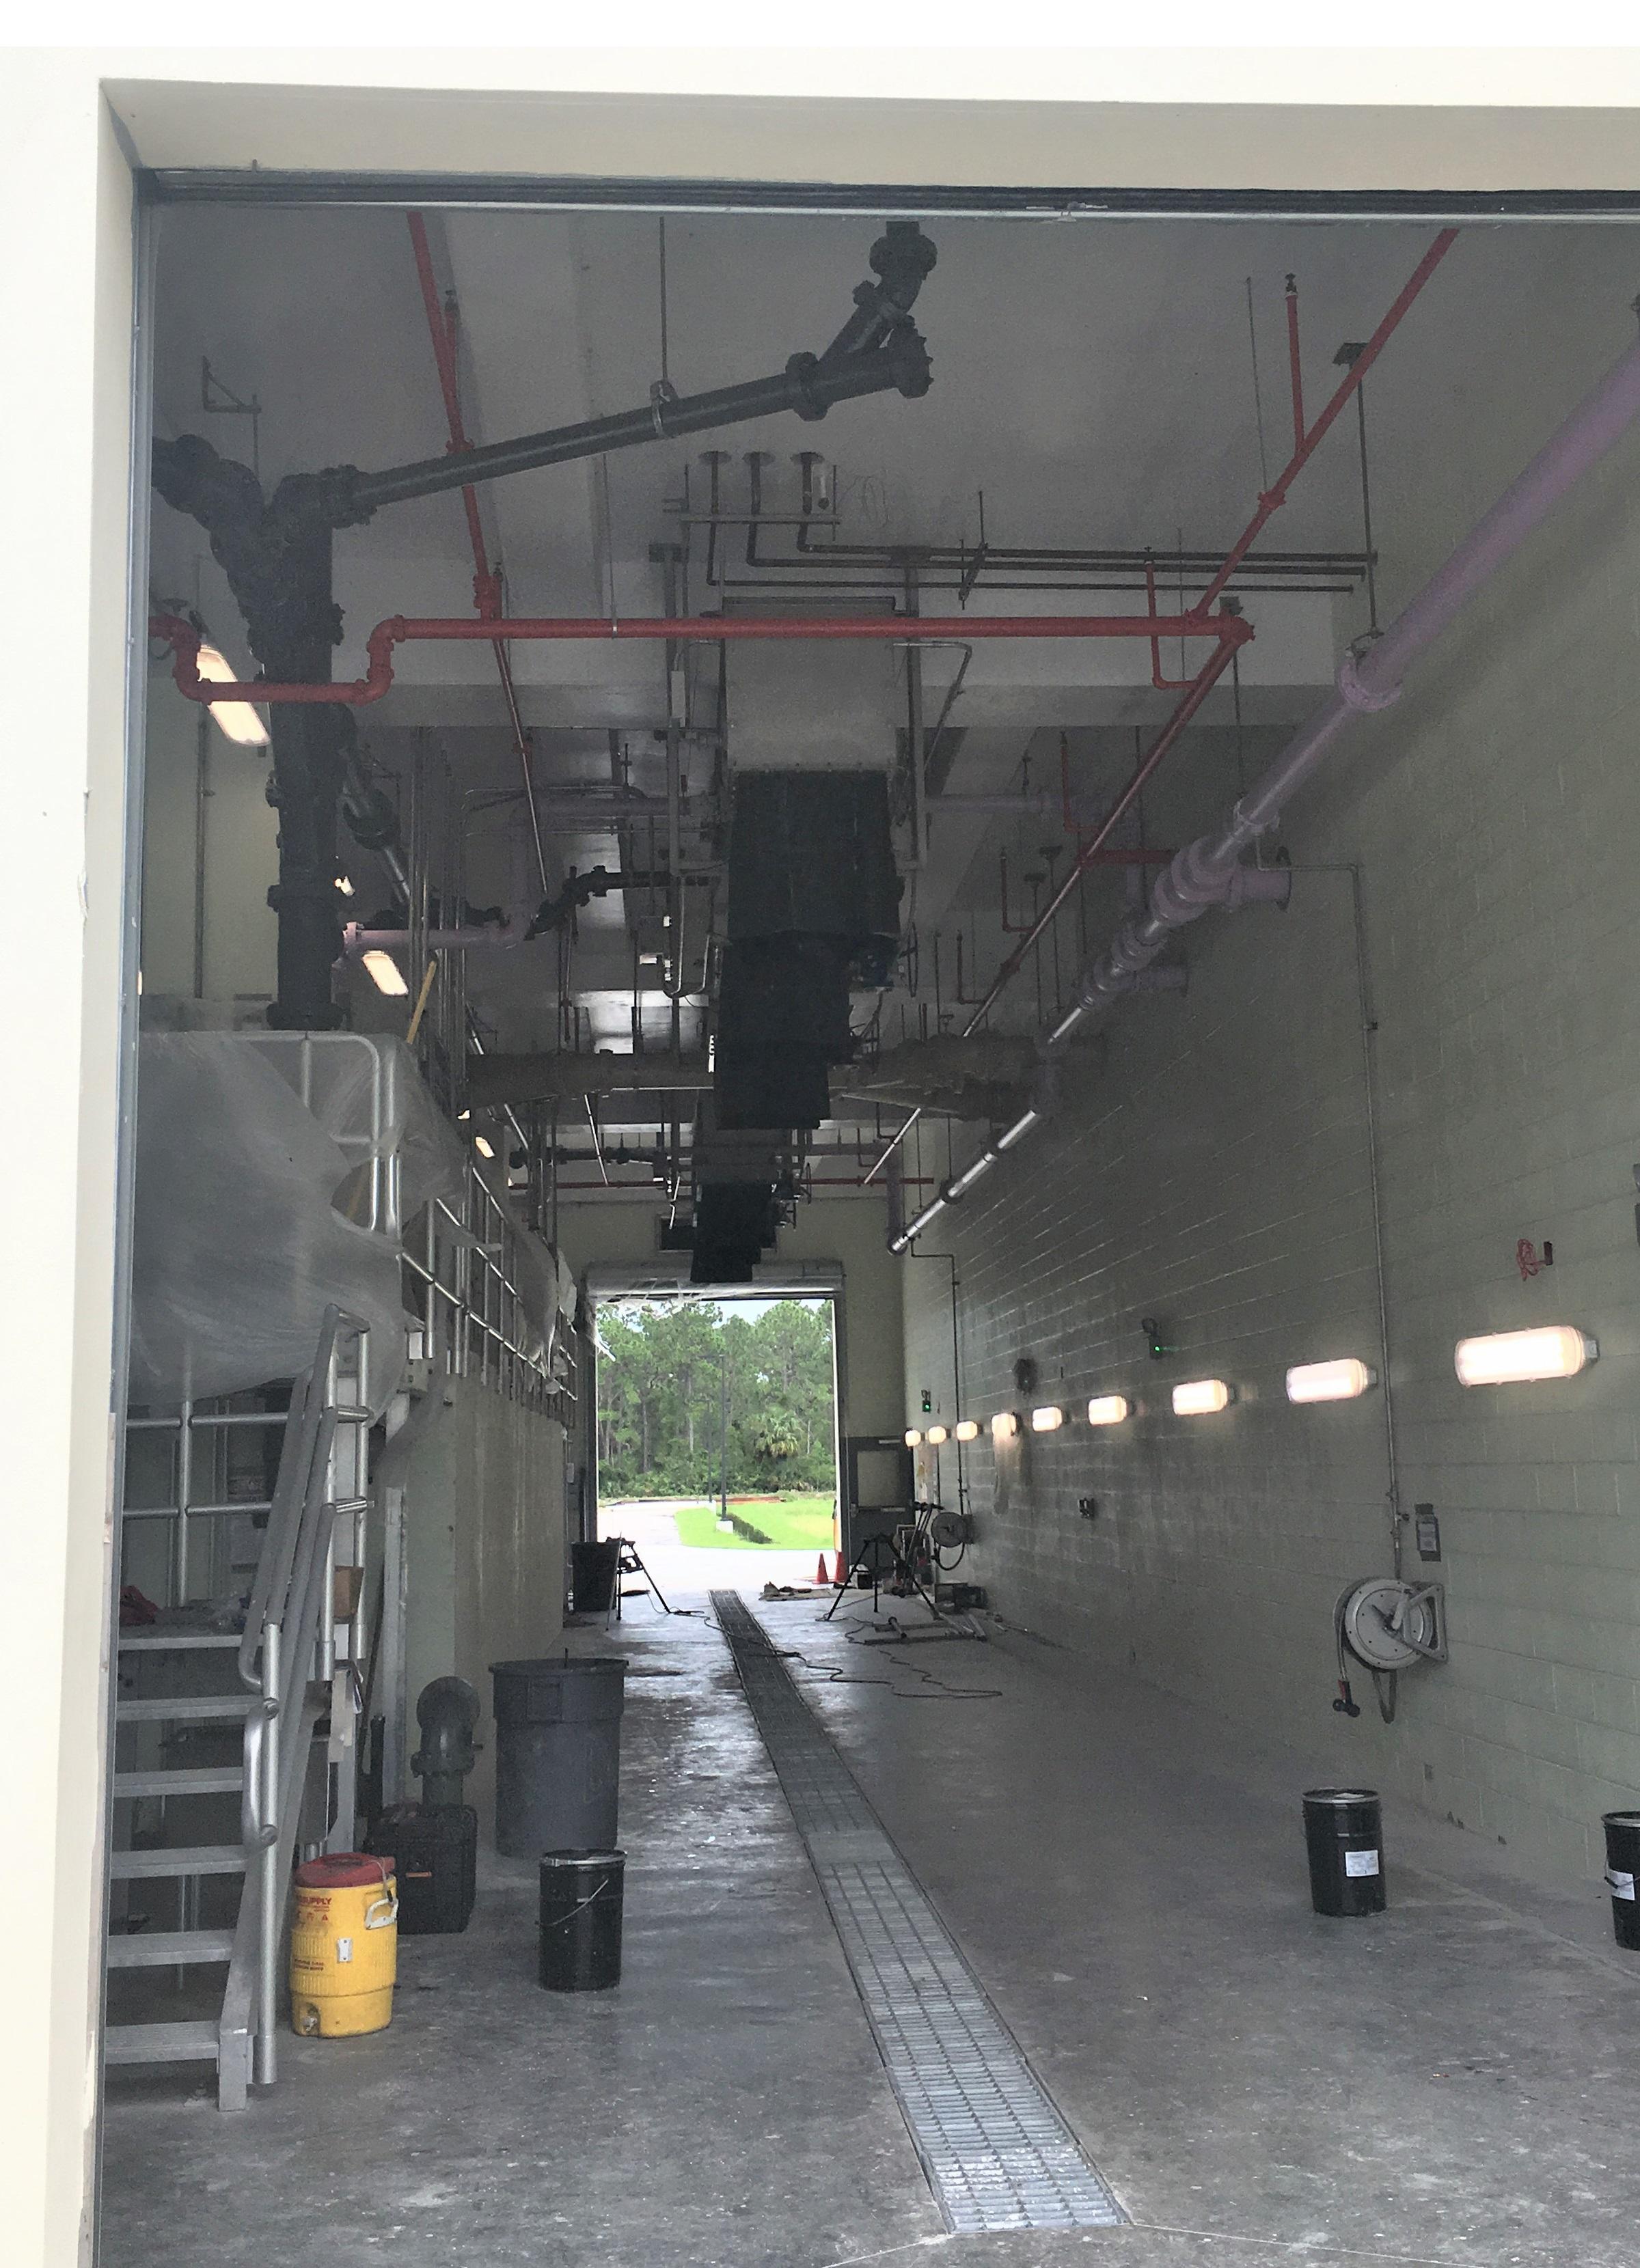 Schwing Bioset Biosolids Truck Loading